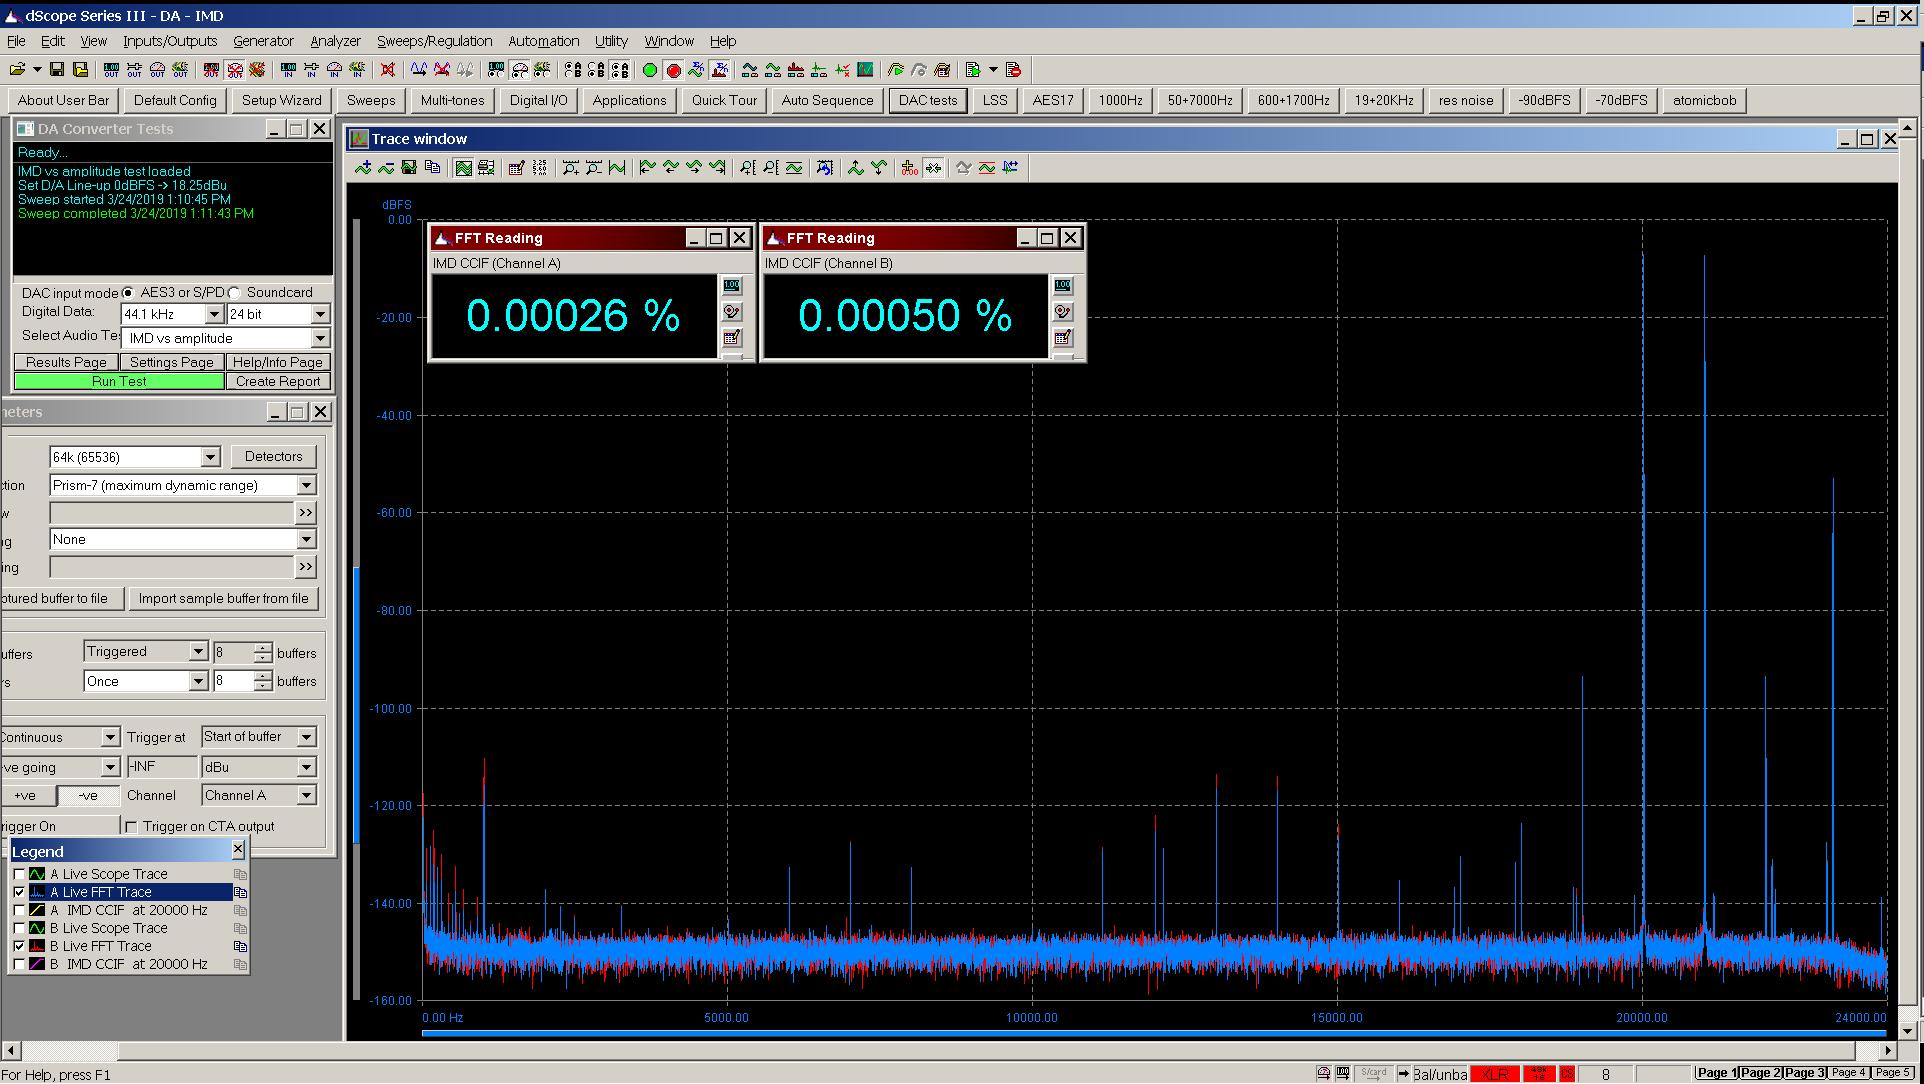 20190323-04 solaris Bal IMD spectrum - AES.PNG